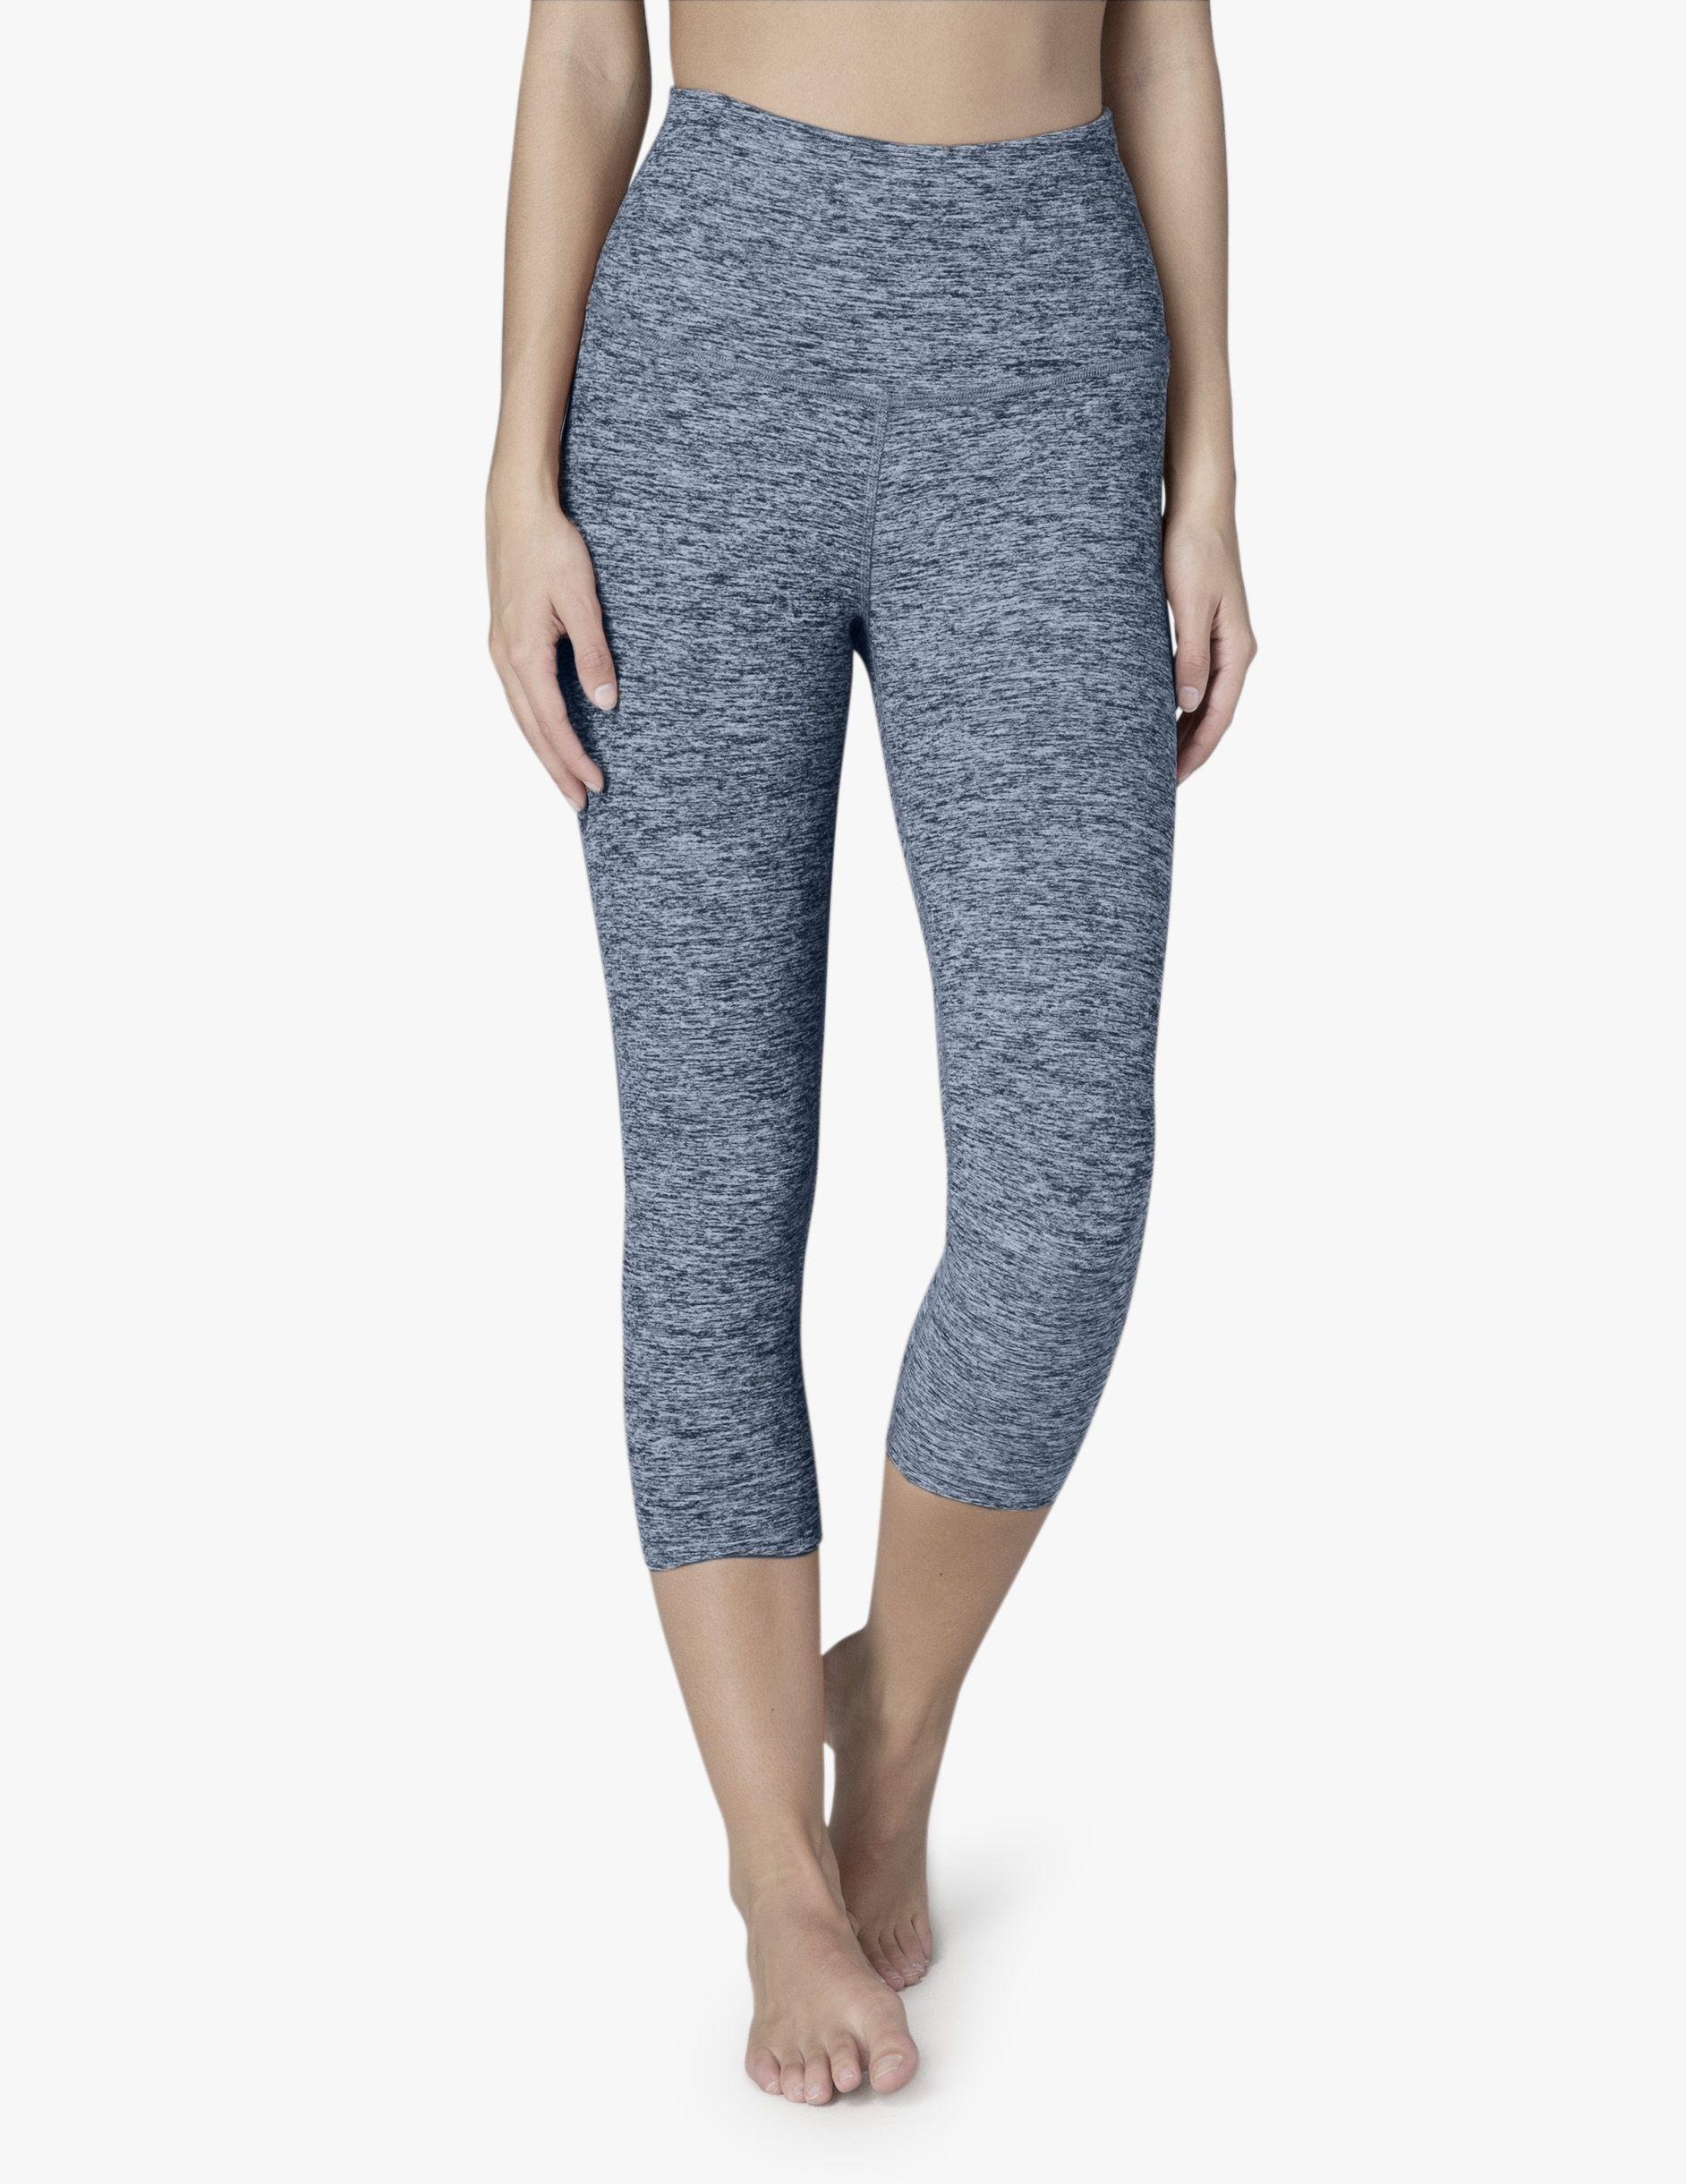 e696649d4b Spacedye Walk and Talk High Waisted Capri Legging in 2019 | NEW STEEZ |  Capri leggings, Capri pants, Pajama pants